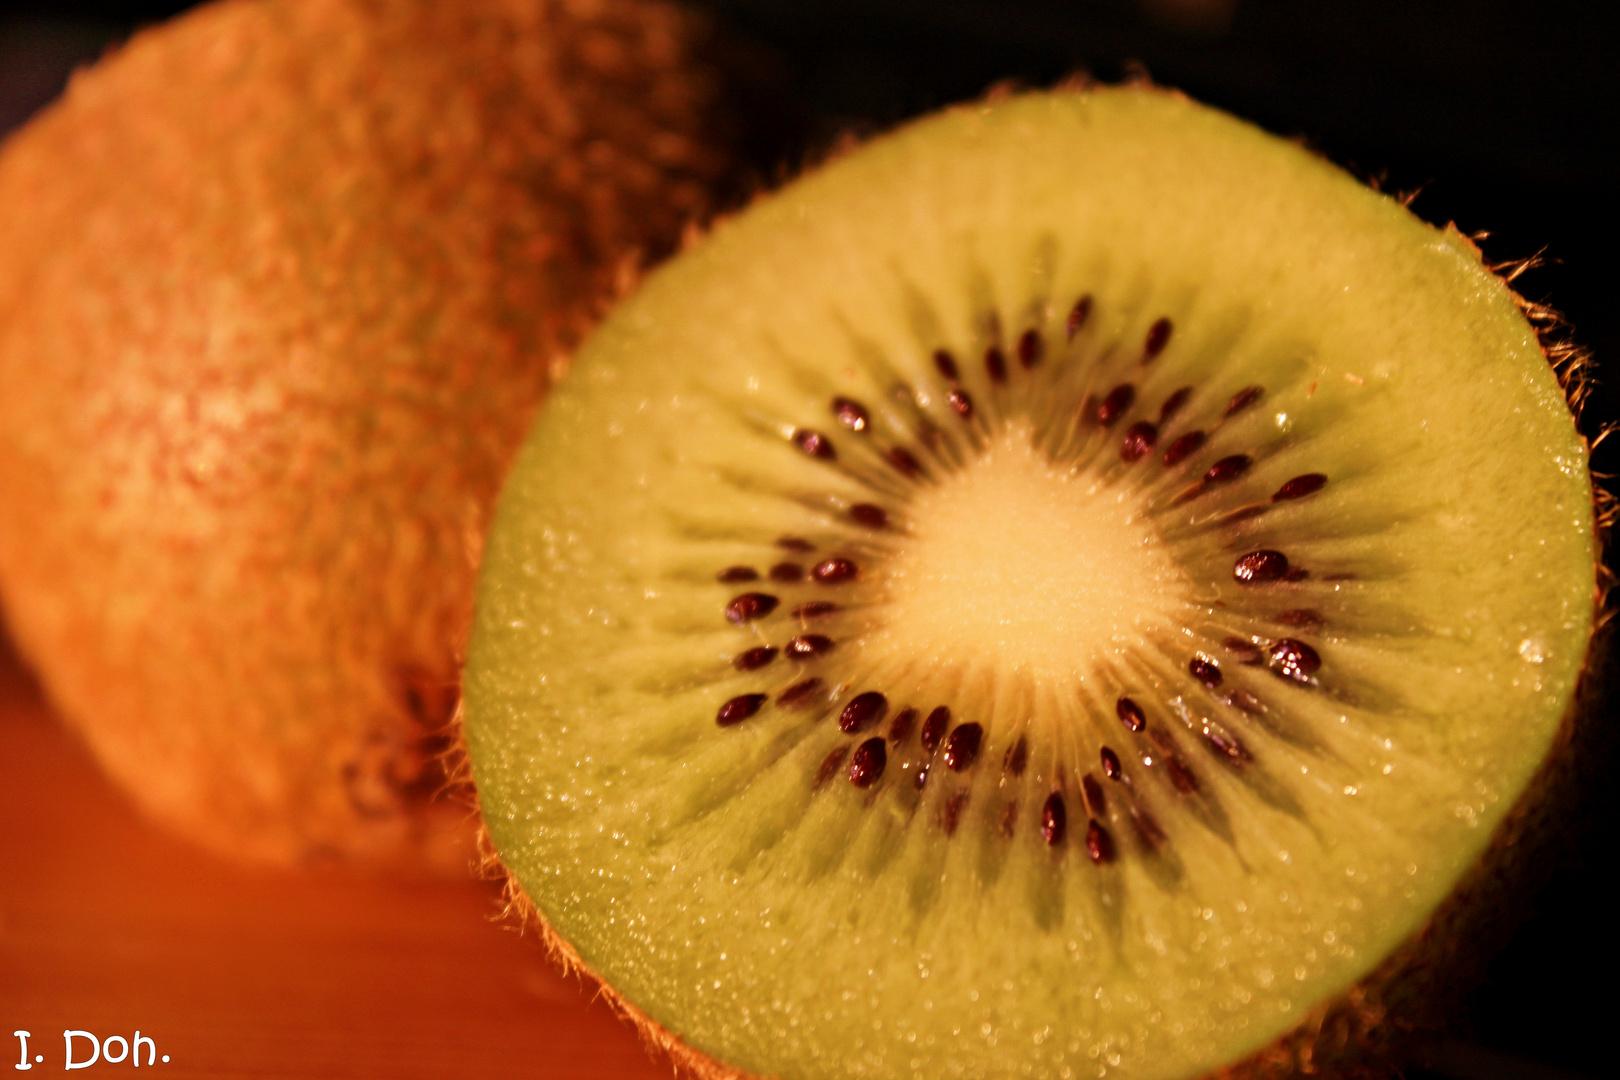 mhmmm... lecker... Kiwi...